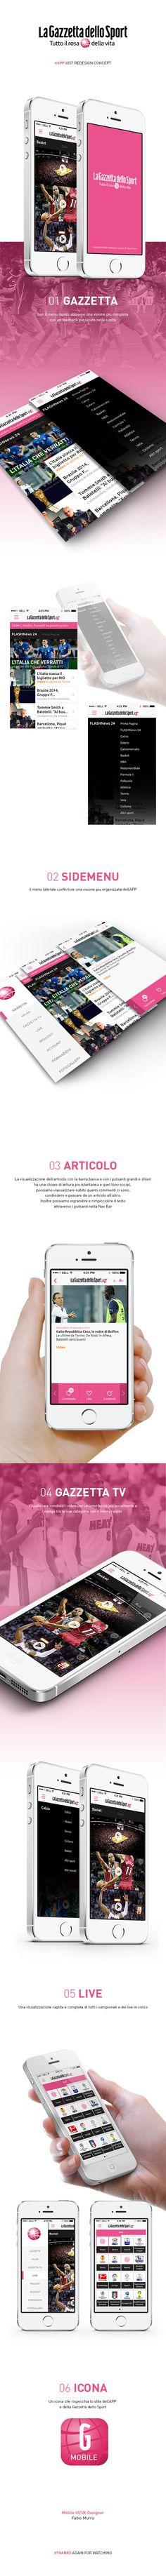 Gazzetta Mobile App, iOS7 Redesign Concept, by Fabio Murru, via Behance